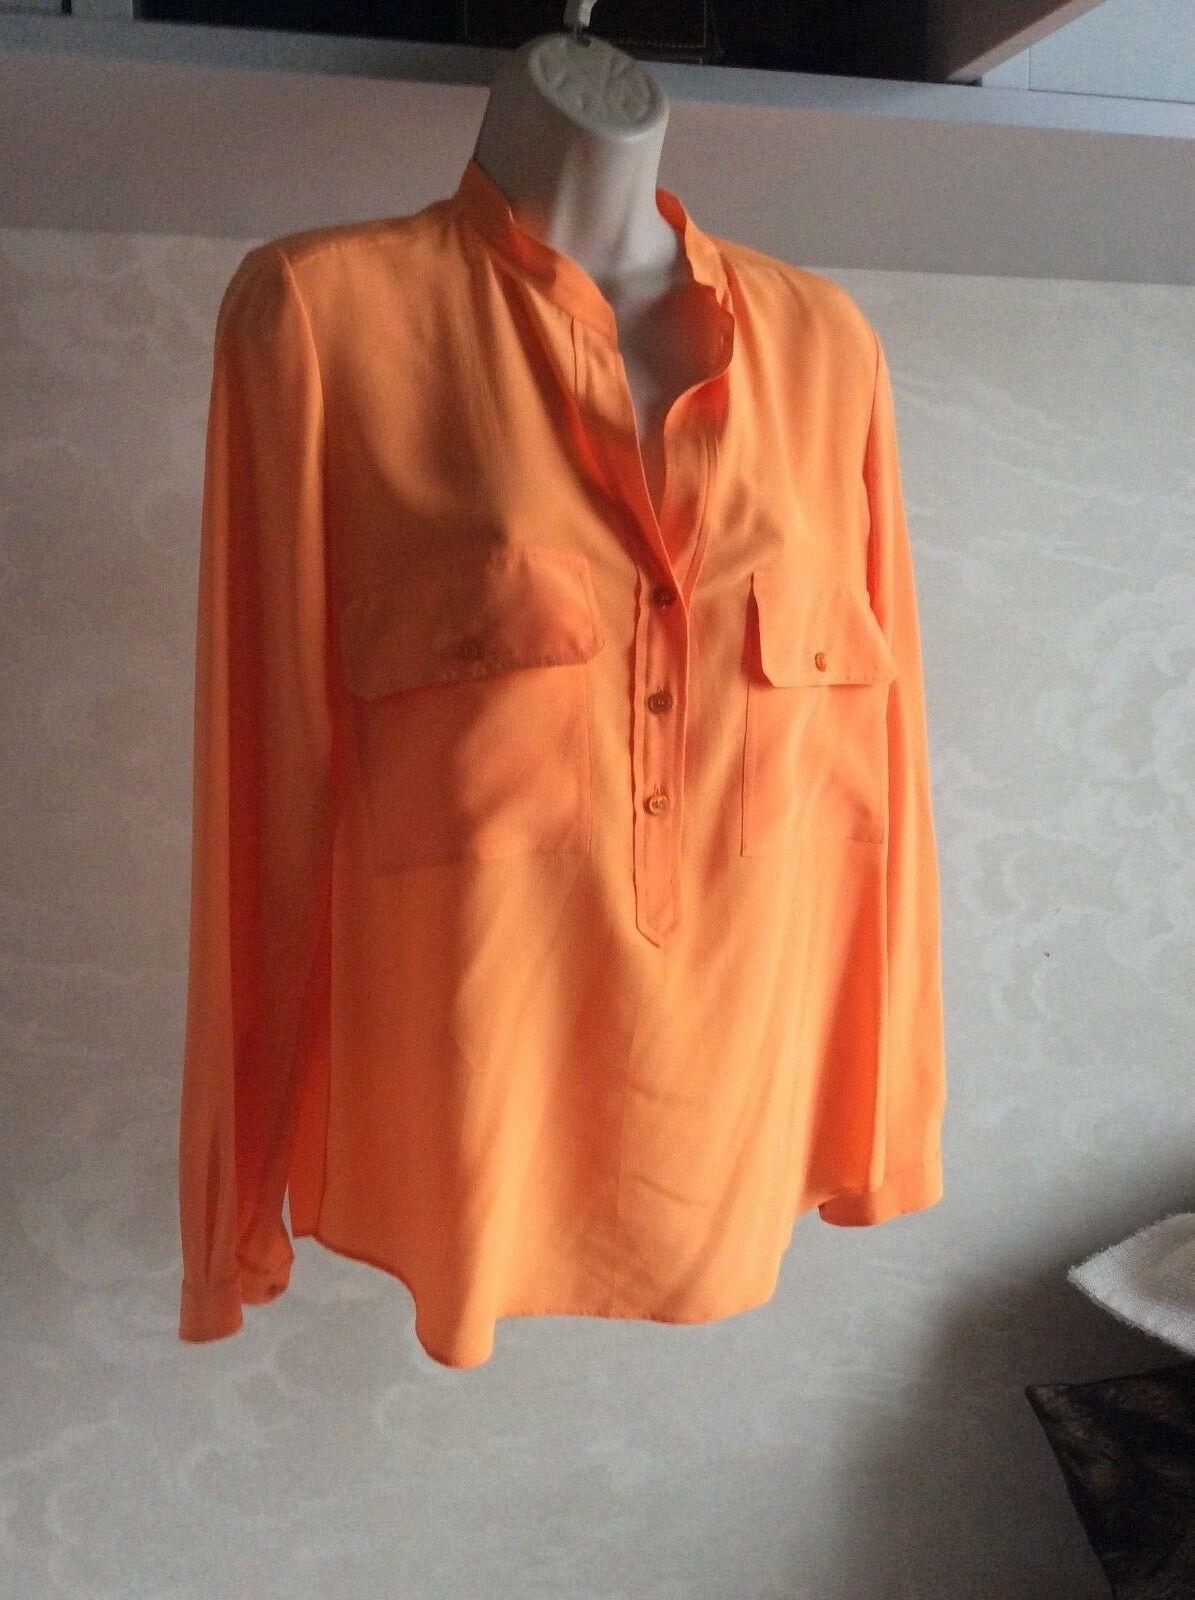 damen's Stella McCartney Orange silk blouse Größe 36